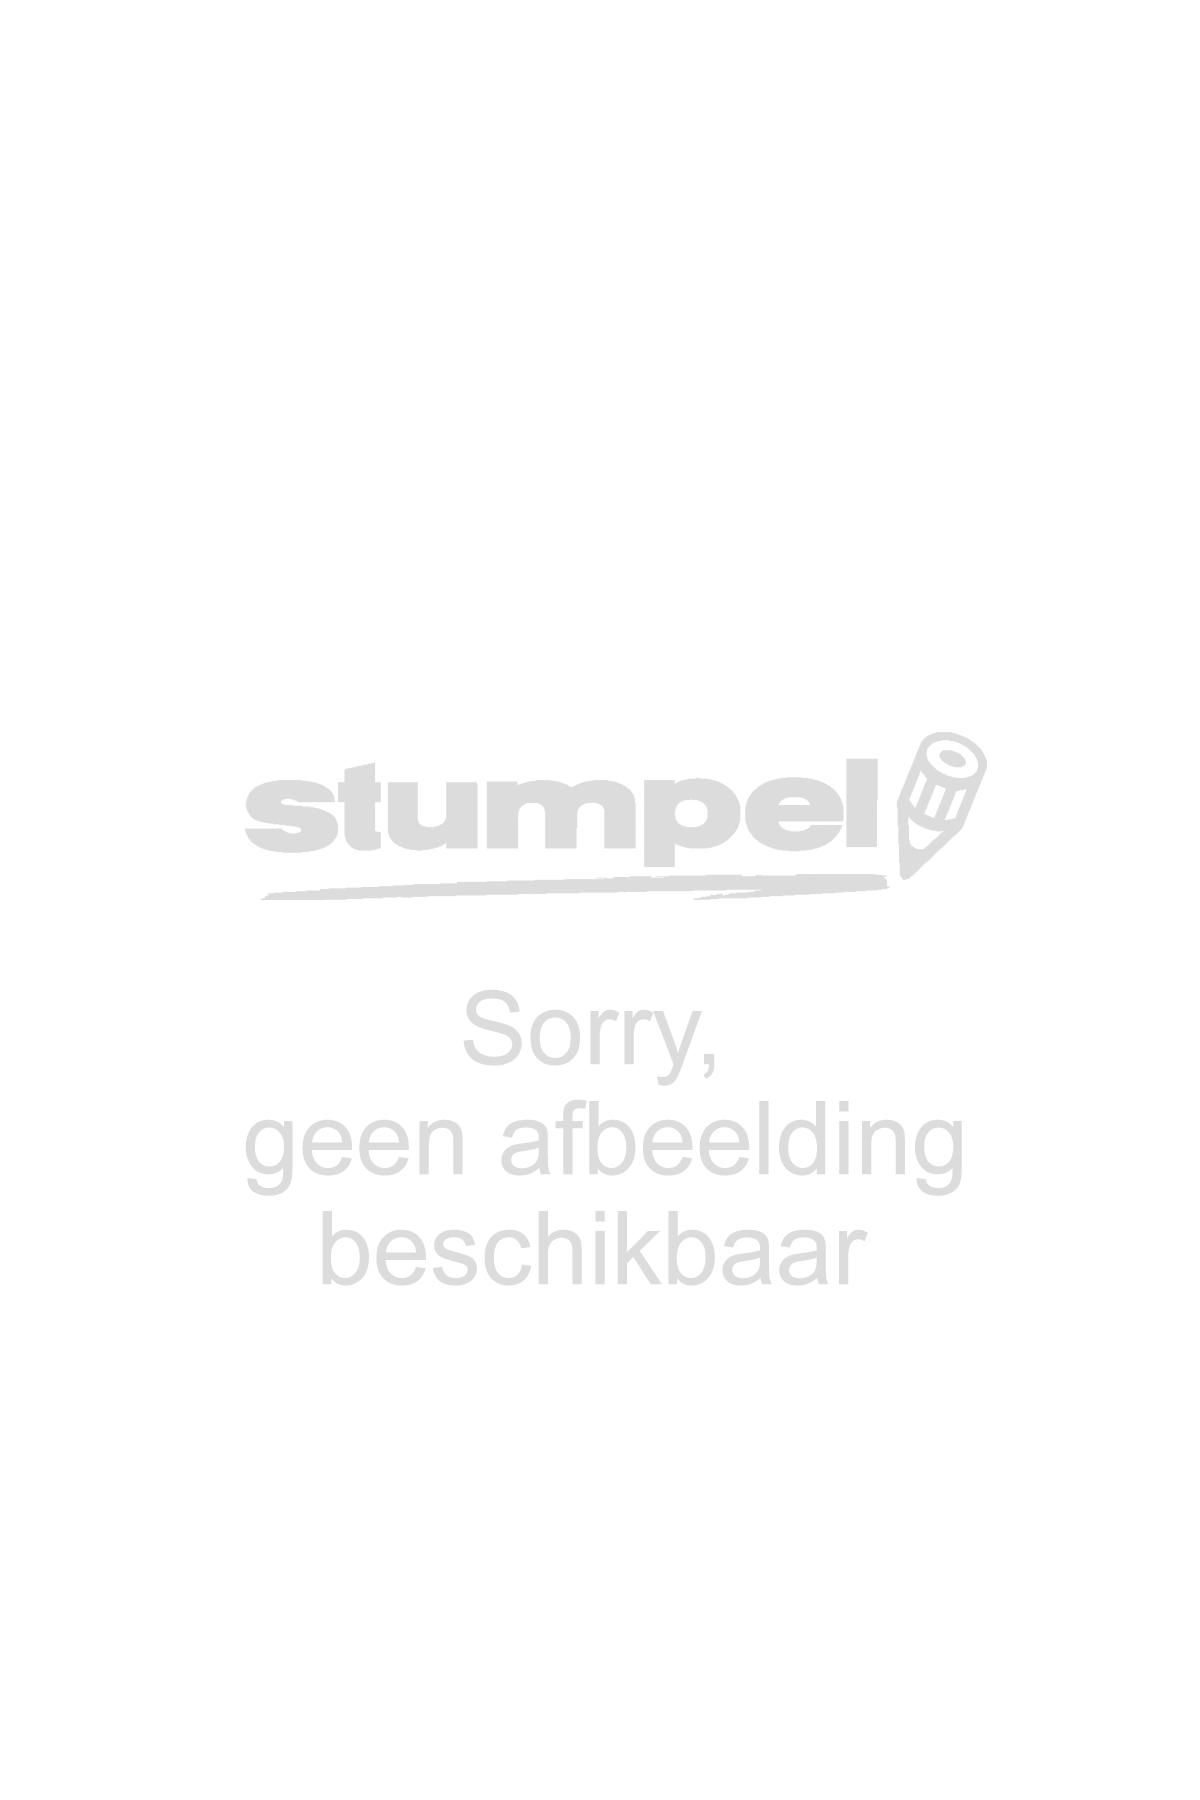 Papierbak Economy metaal 15L blauw (A2910-56)